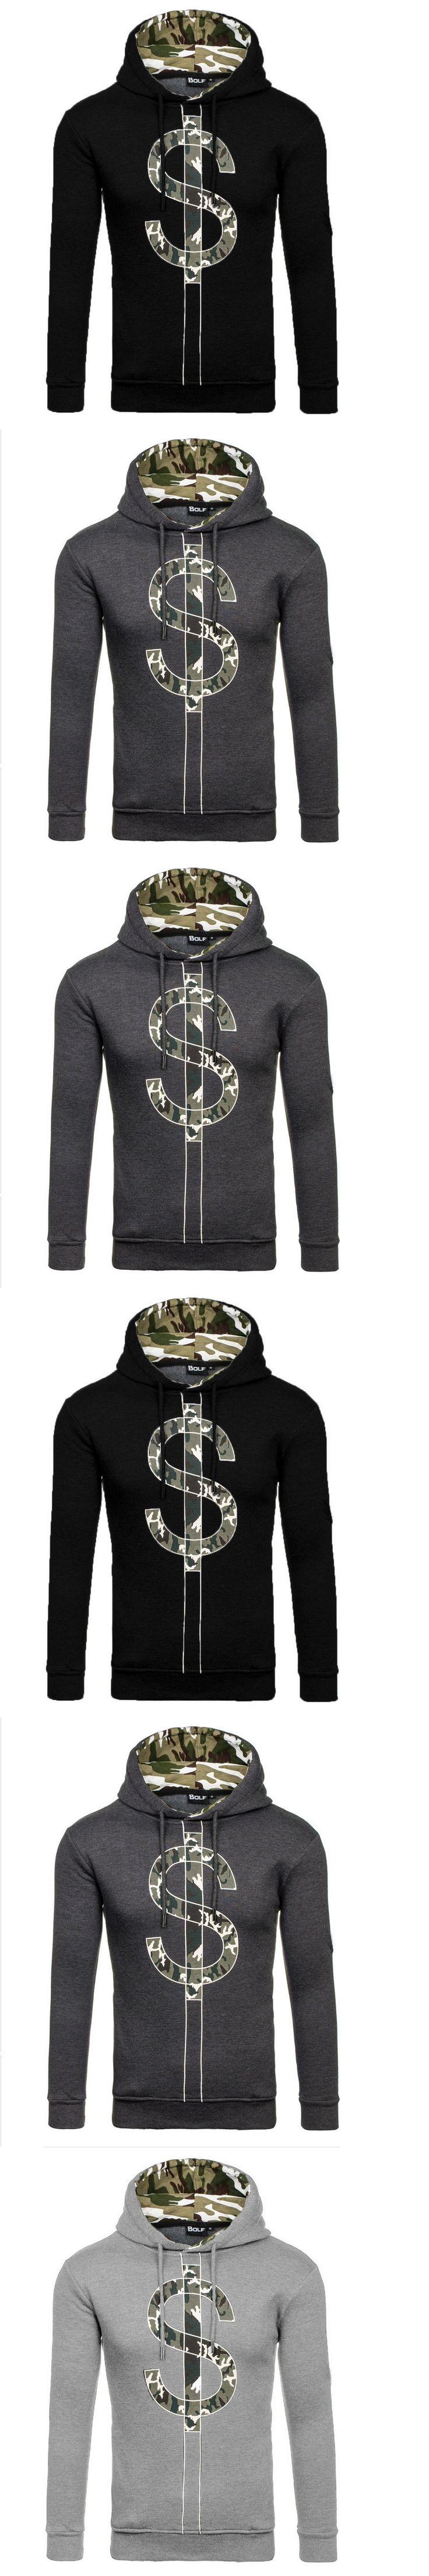 Men Fashion Camouflage Letter Print Hoodie Spring Autumn Pullover Outwear Thickening Warm Hooded Sweatshirt